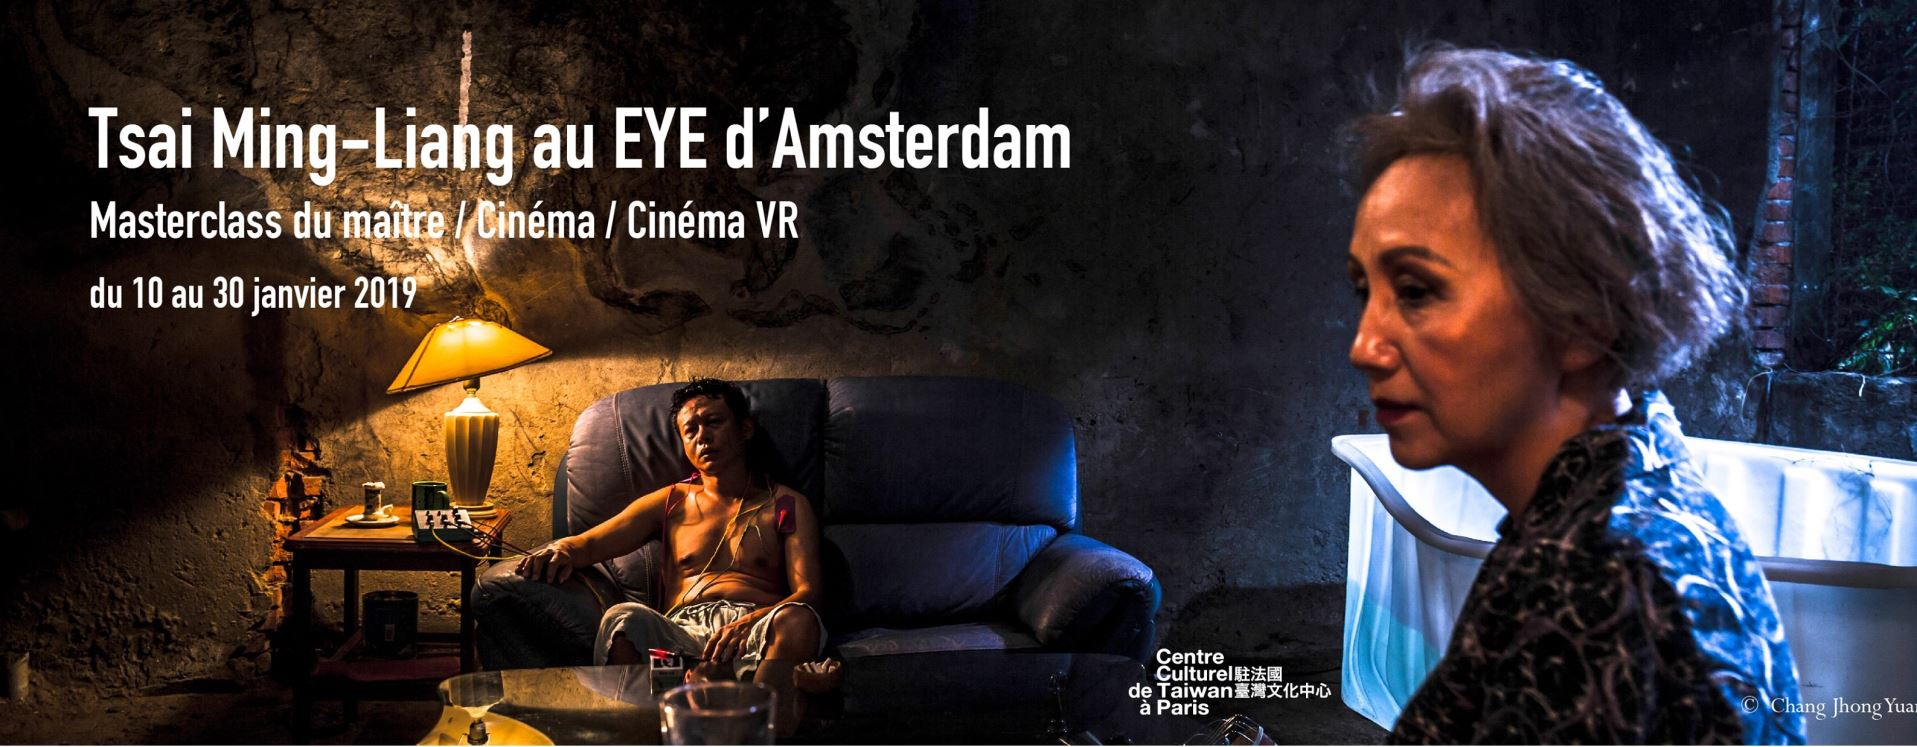 Dutch film institute to hold 14-film retrospective on Tsai Ming-liang[另開新視窗]